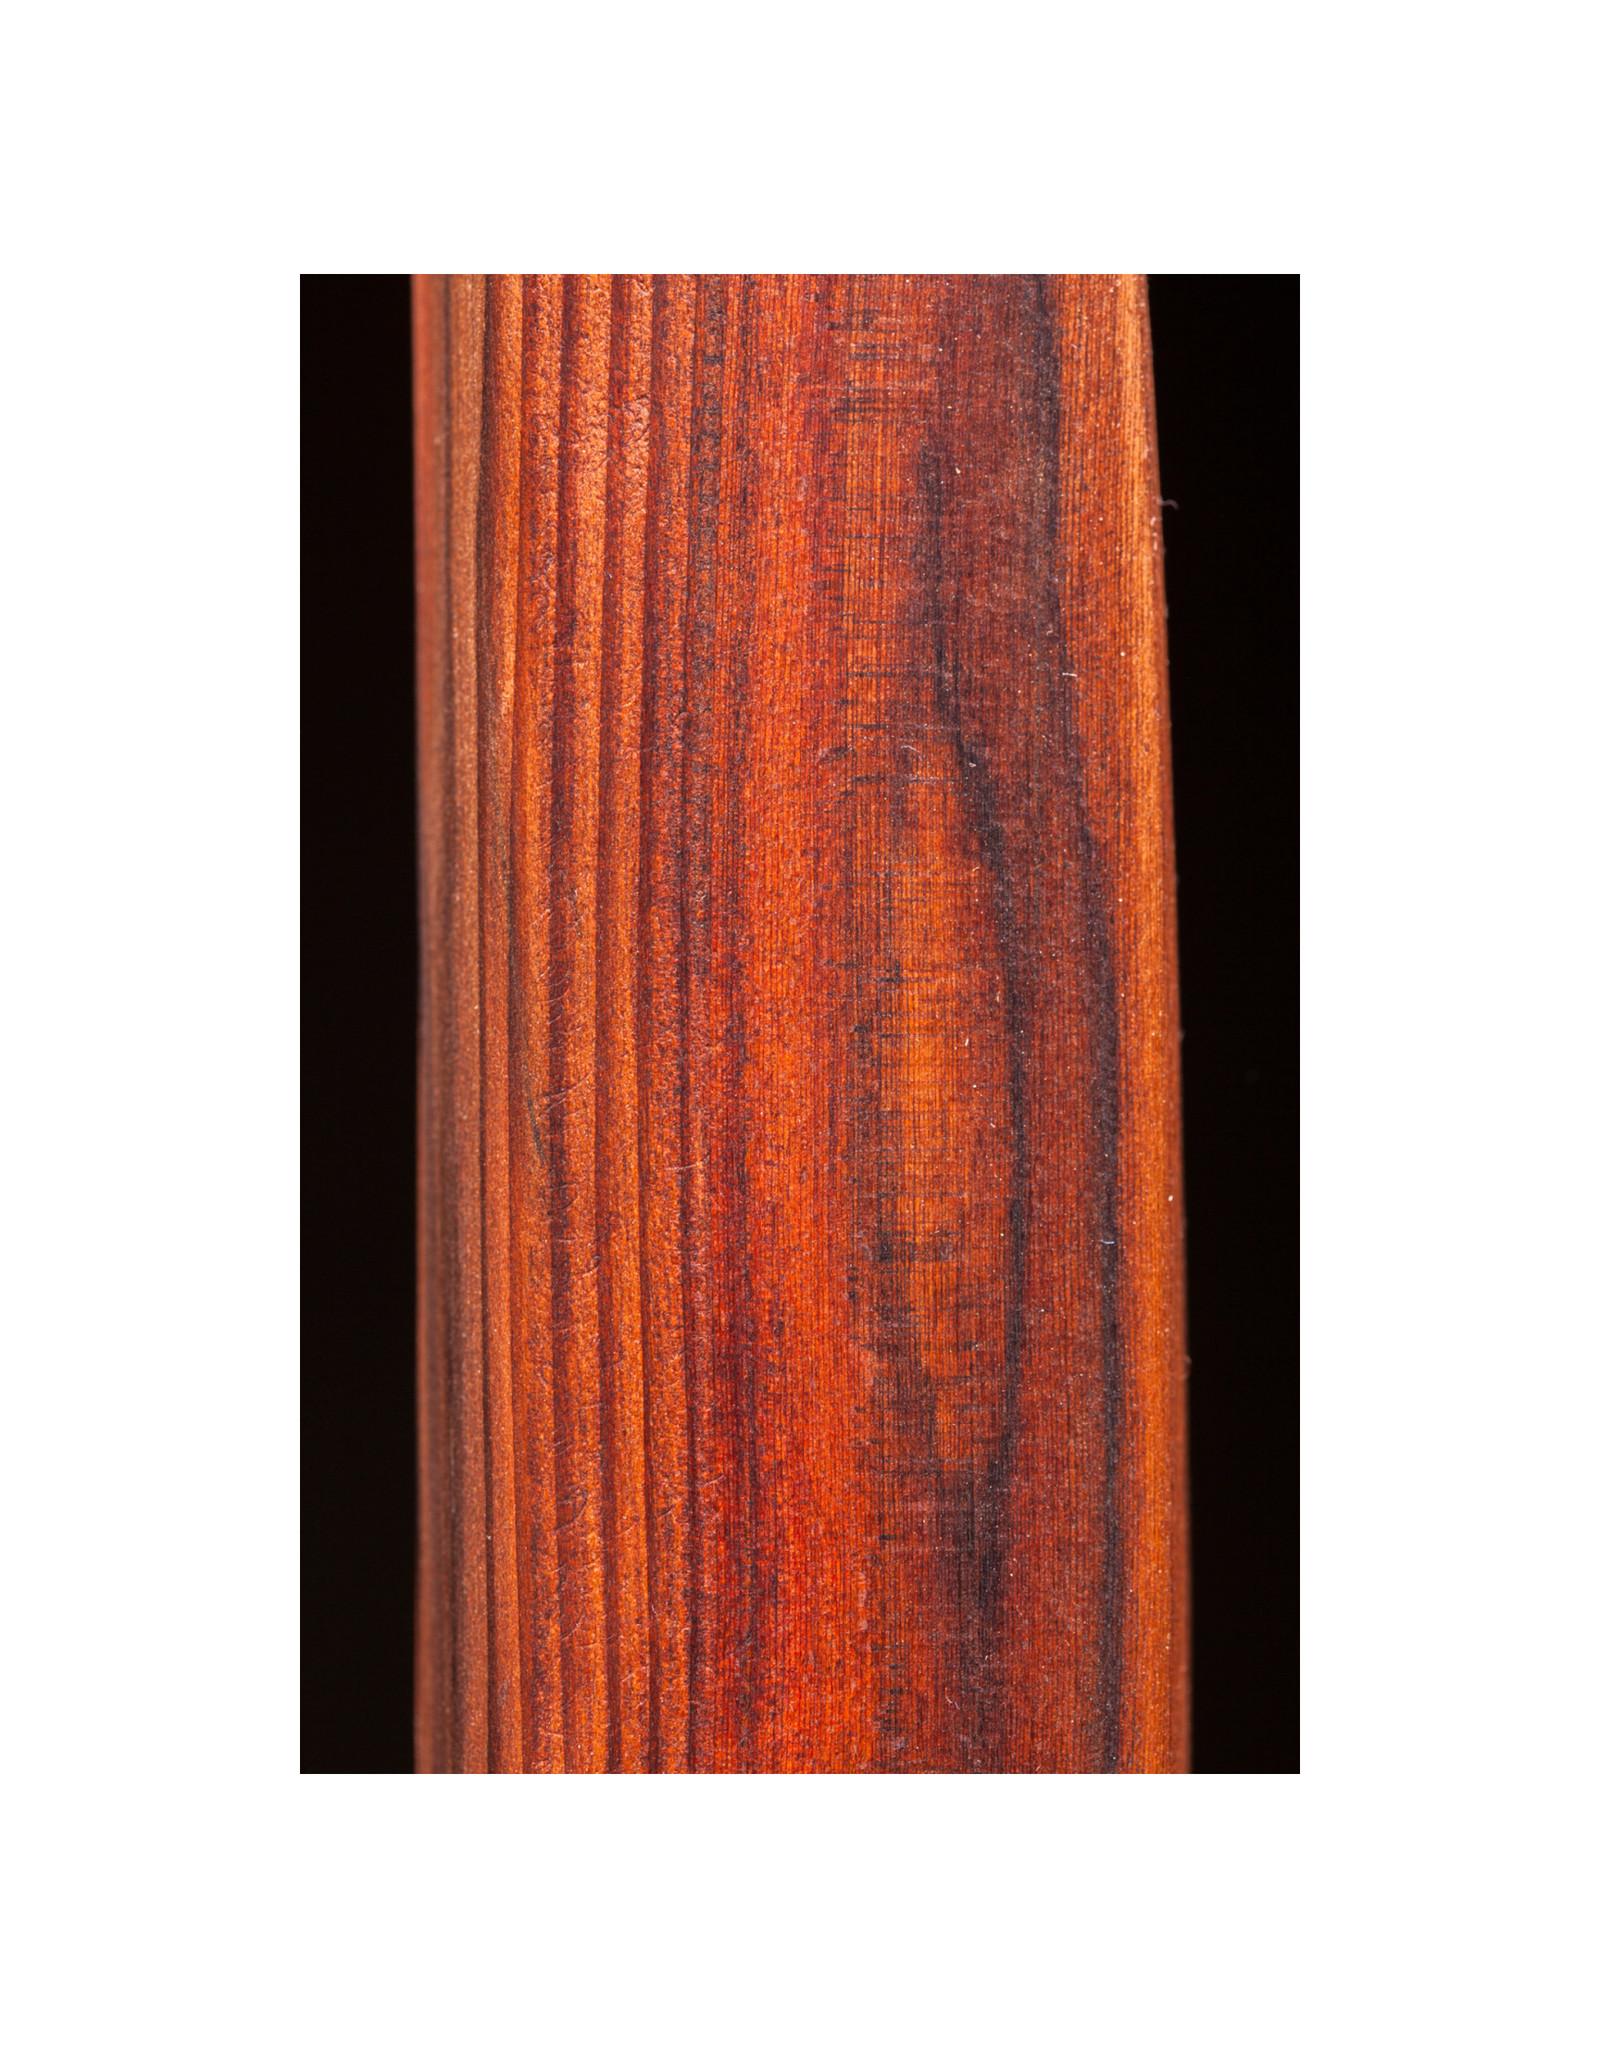 Ceremonial Redwood - No. 5